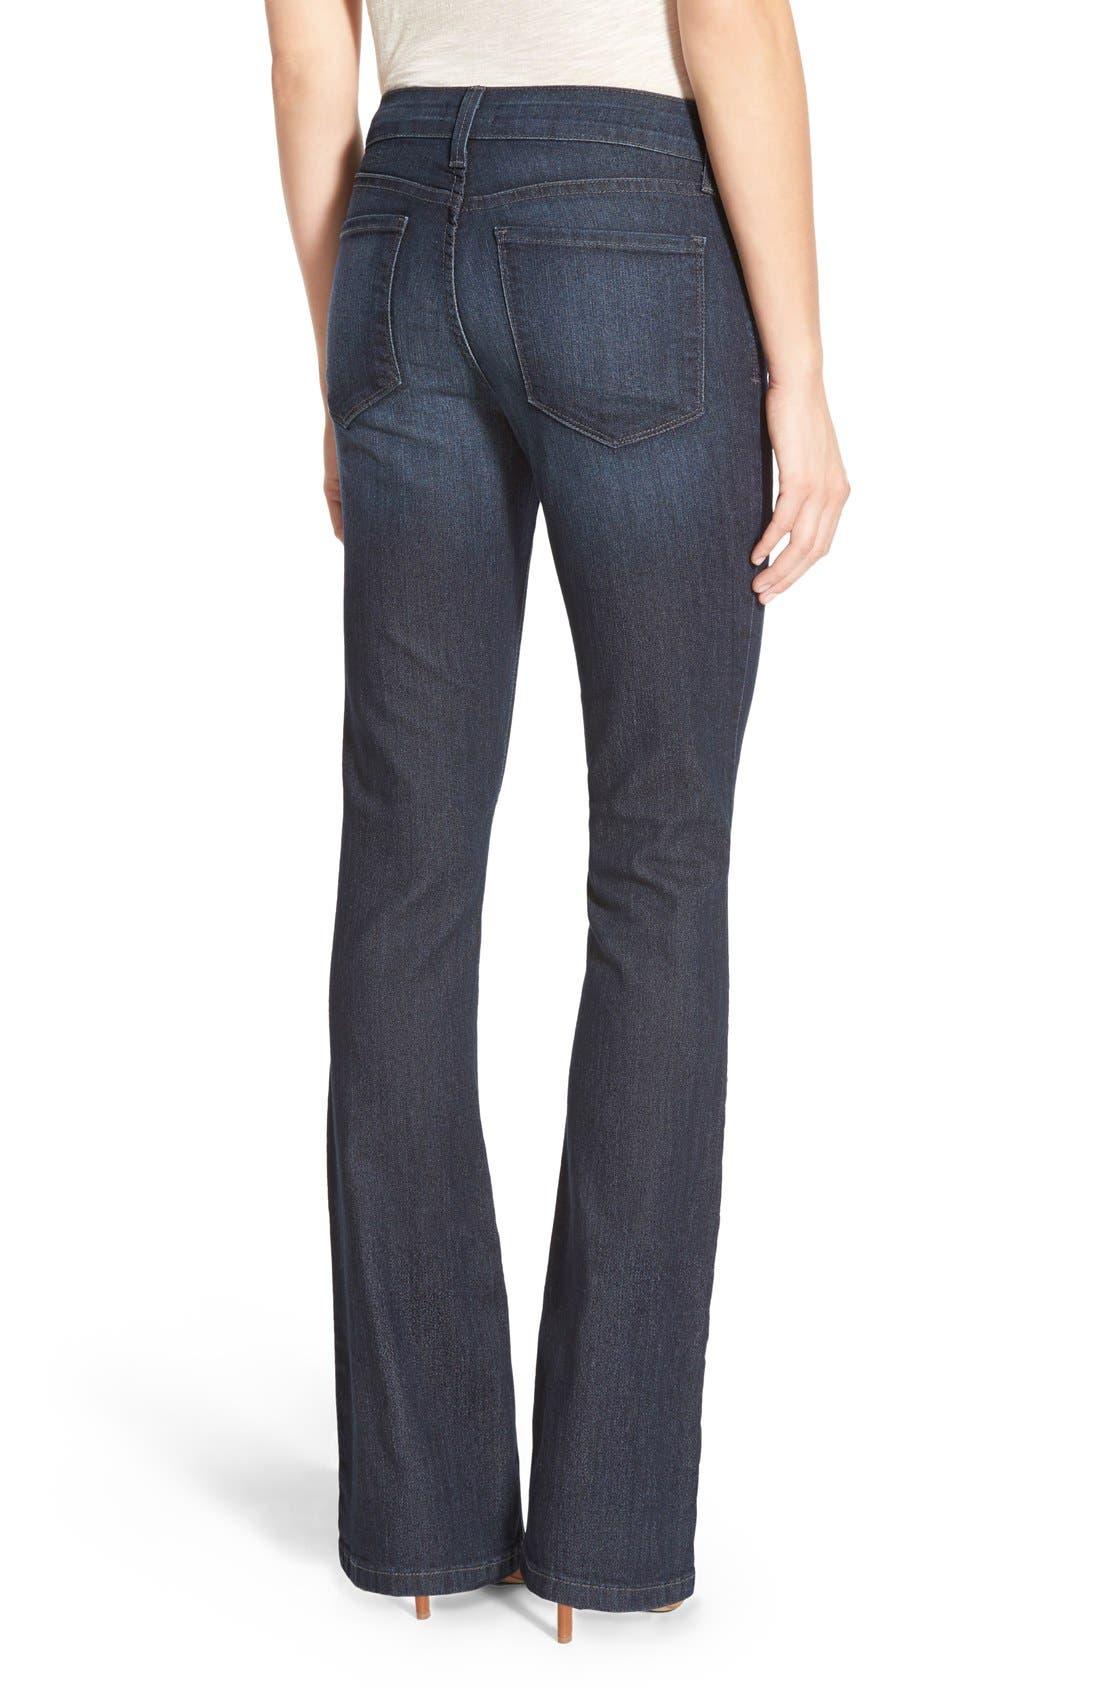 Alternate Image 2  - NYDJ 'Billie' Stretch Mini Bootcut Jeans (Burbank)